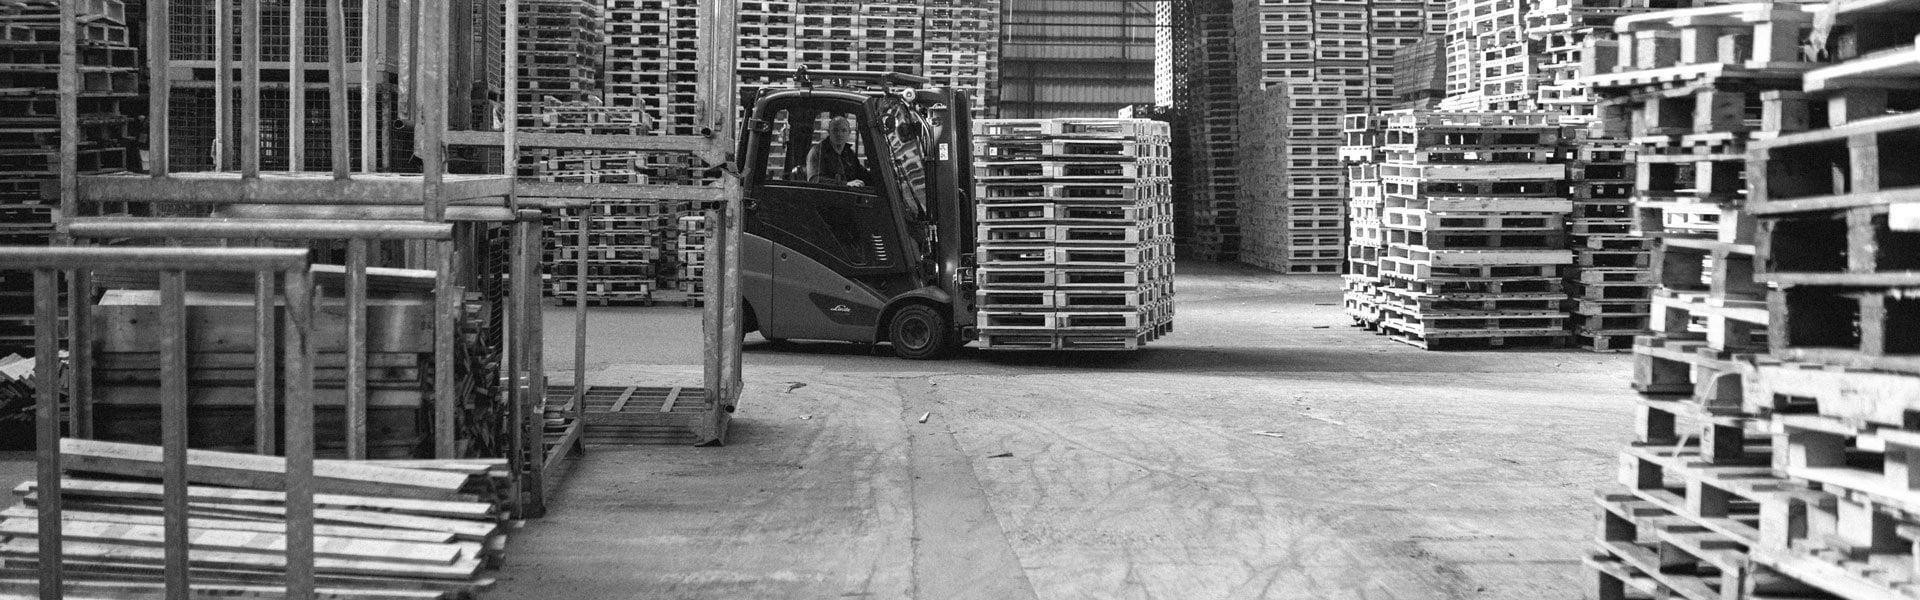 Mulder Recycling pallethandel stapels pallets